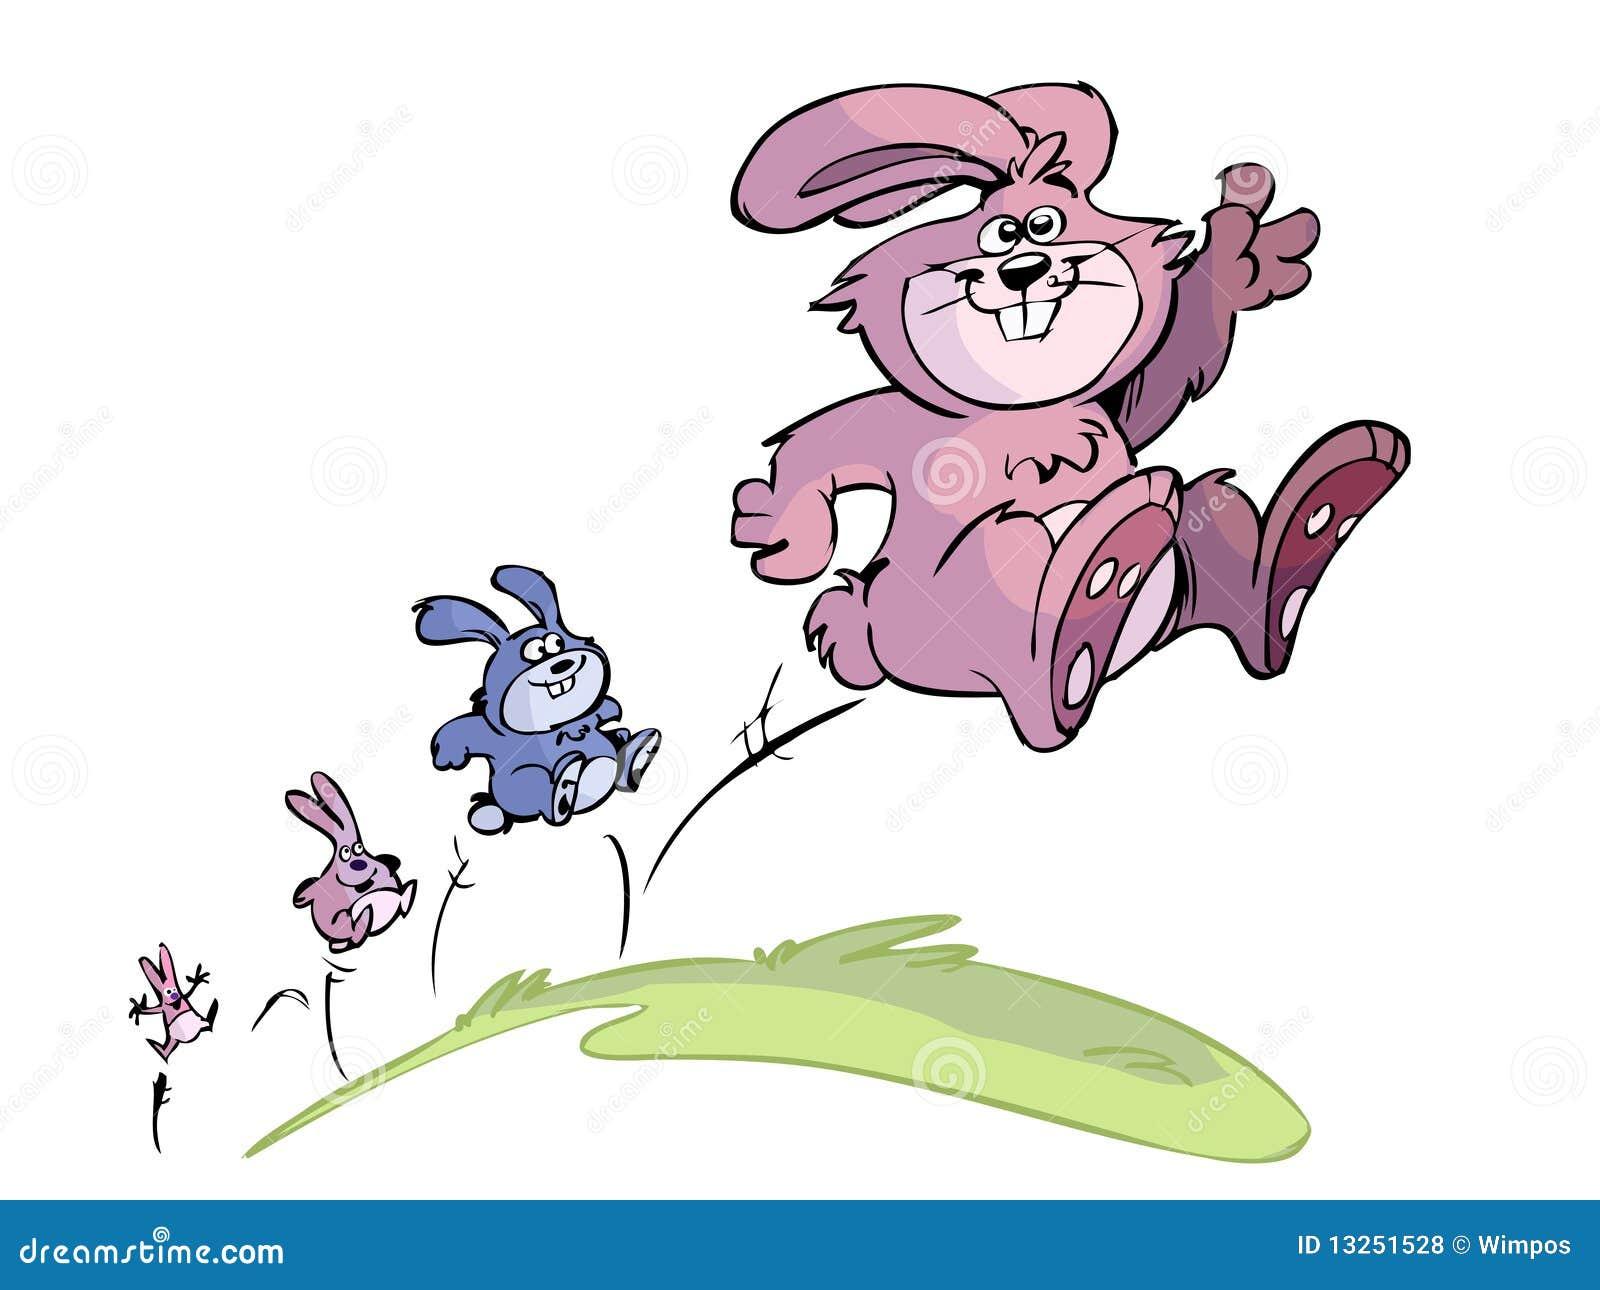 jumping frog cartoon